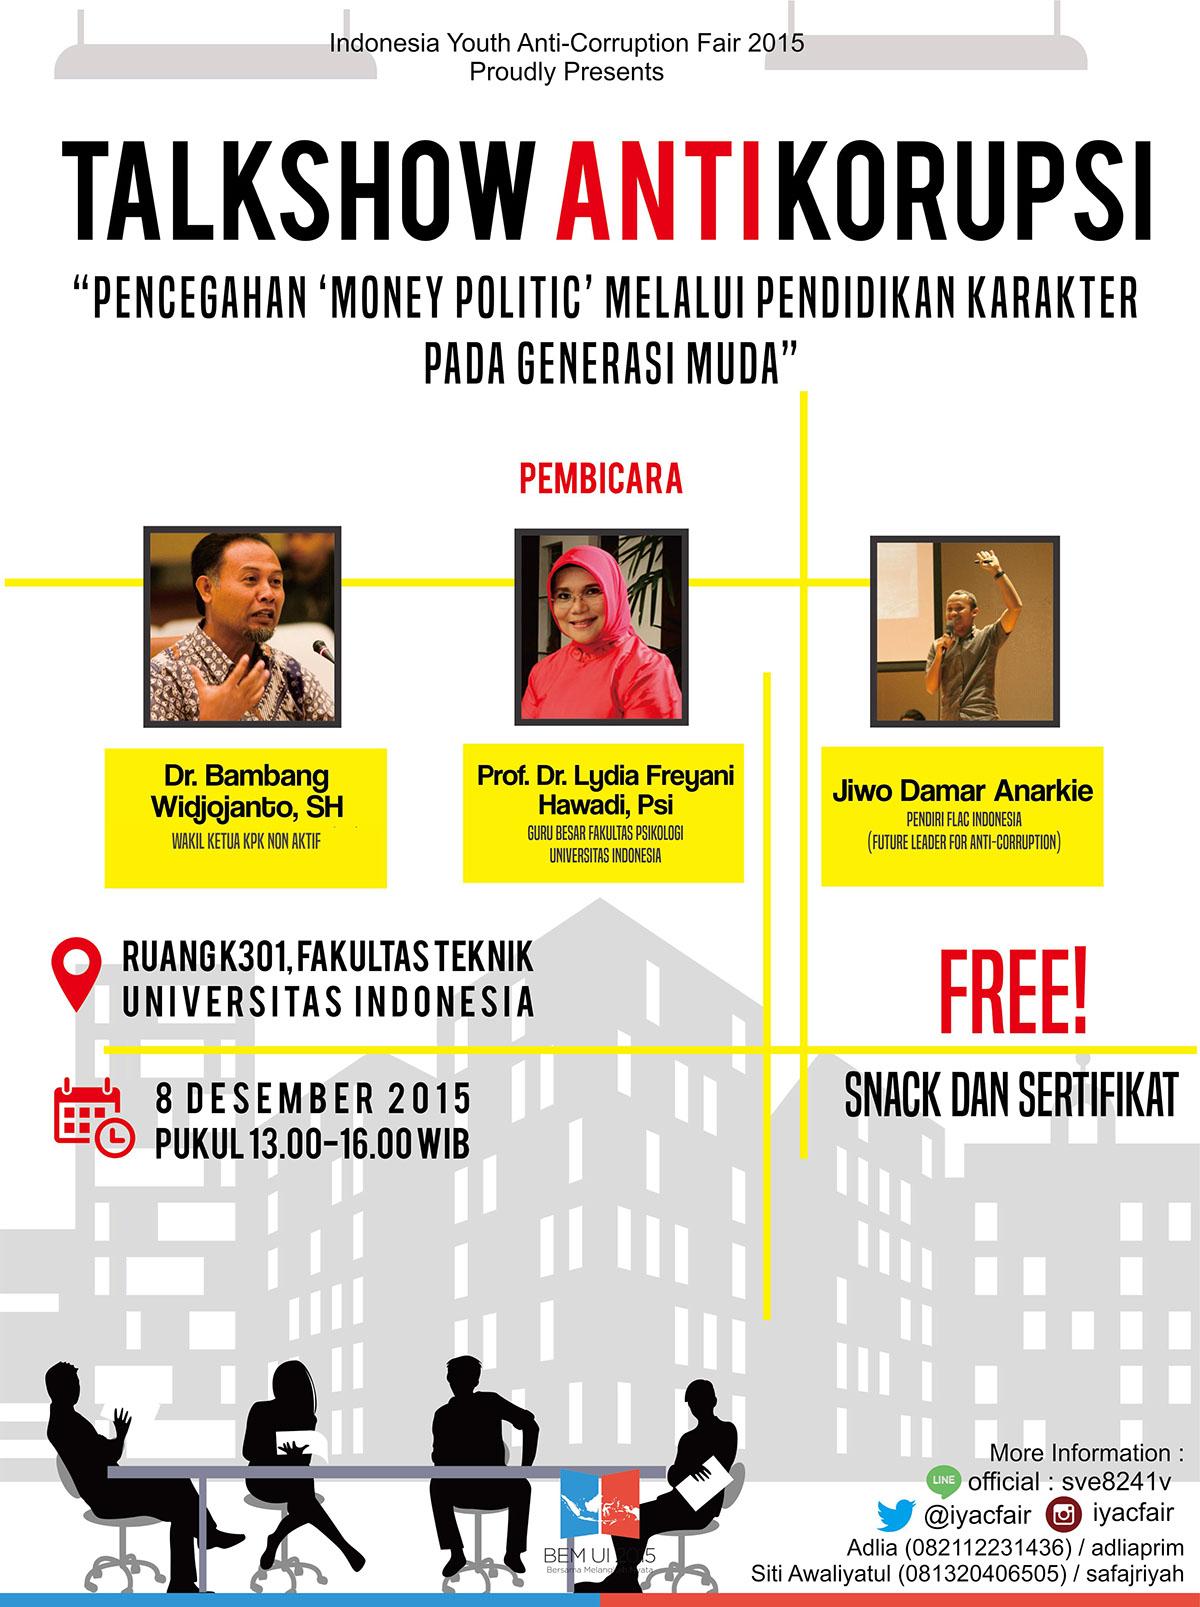 Poster Talkshow Anti Korupsi Iyac Fair Ui 2015 On Behance